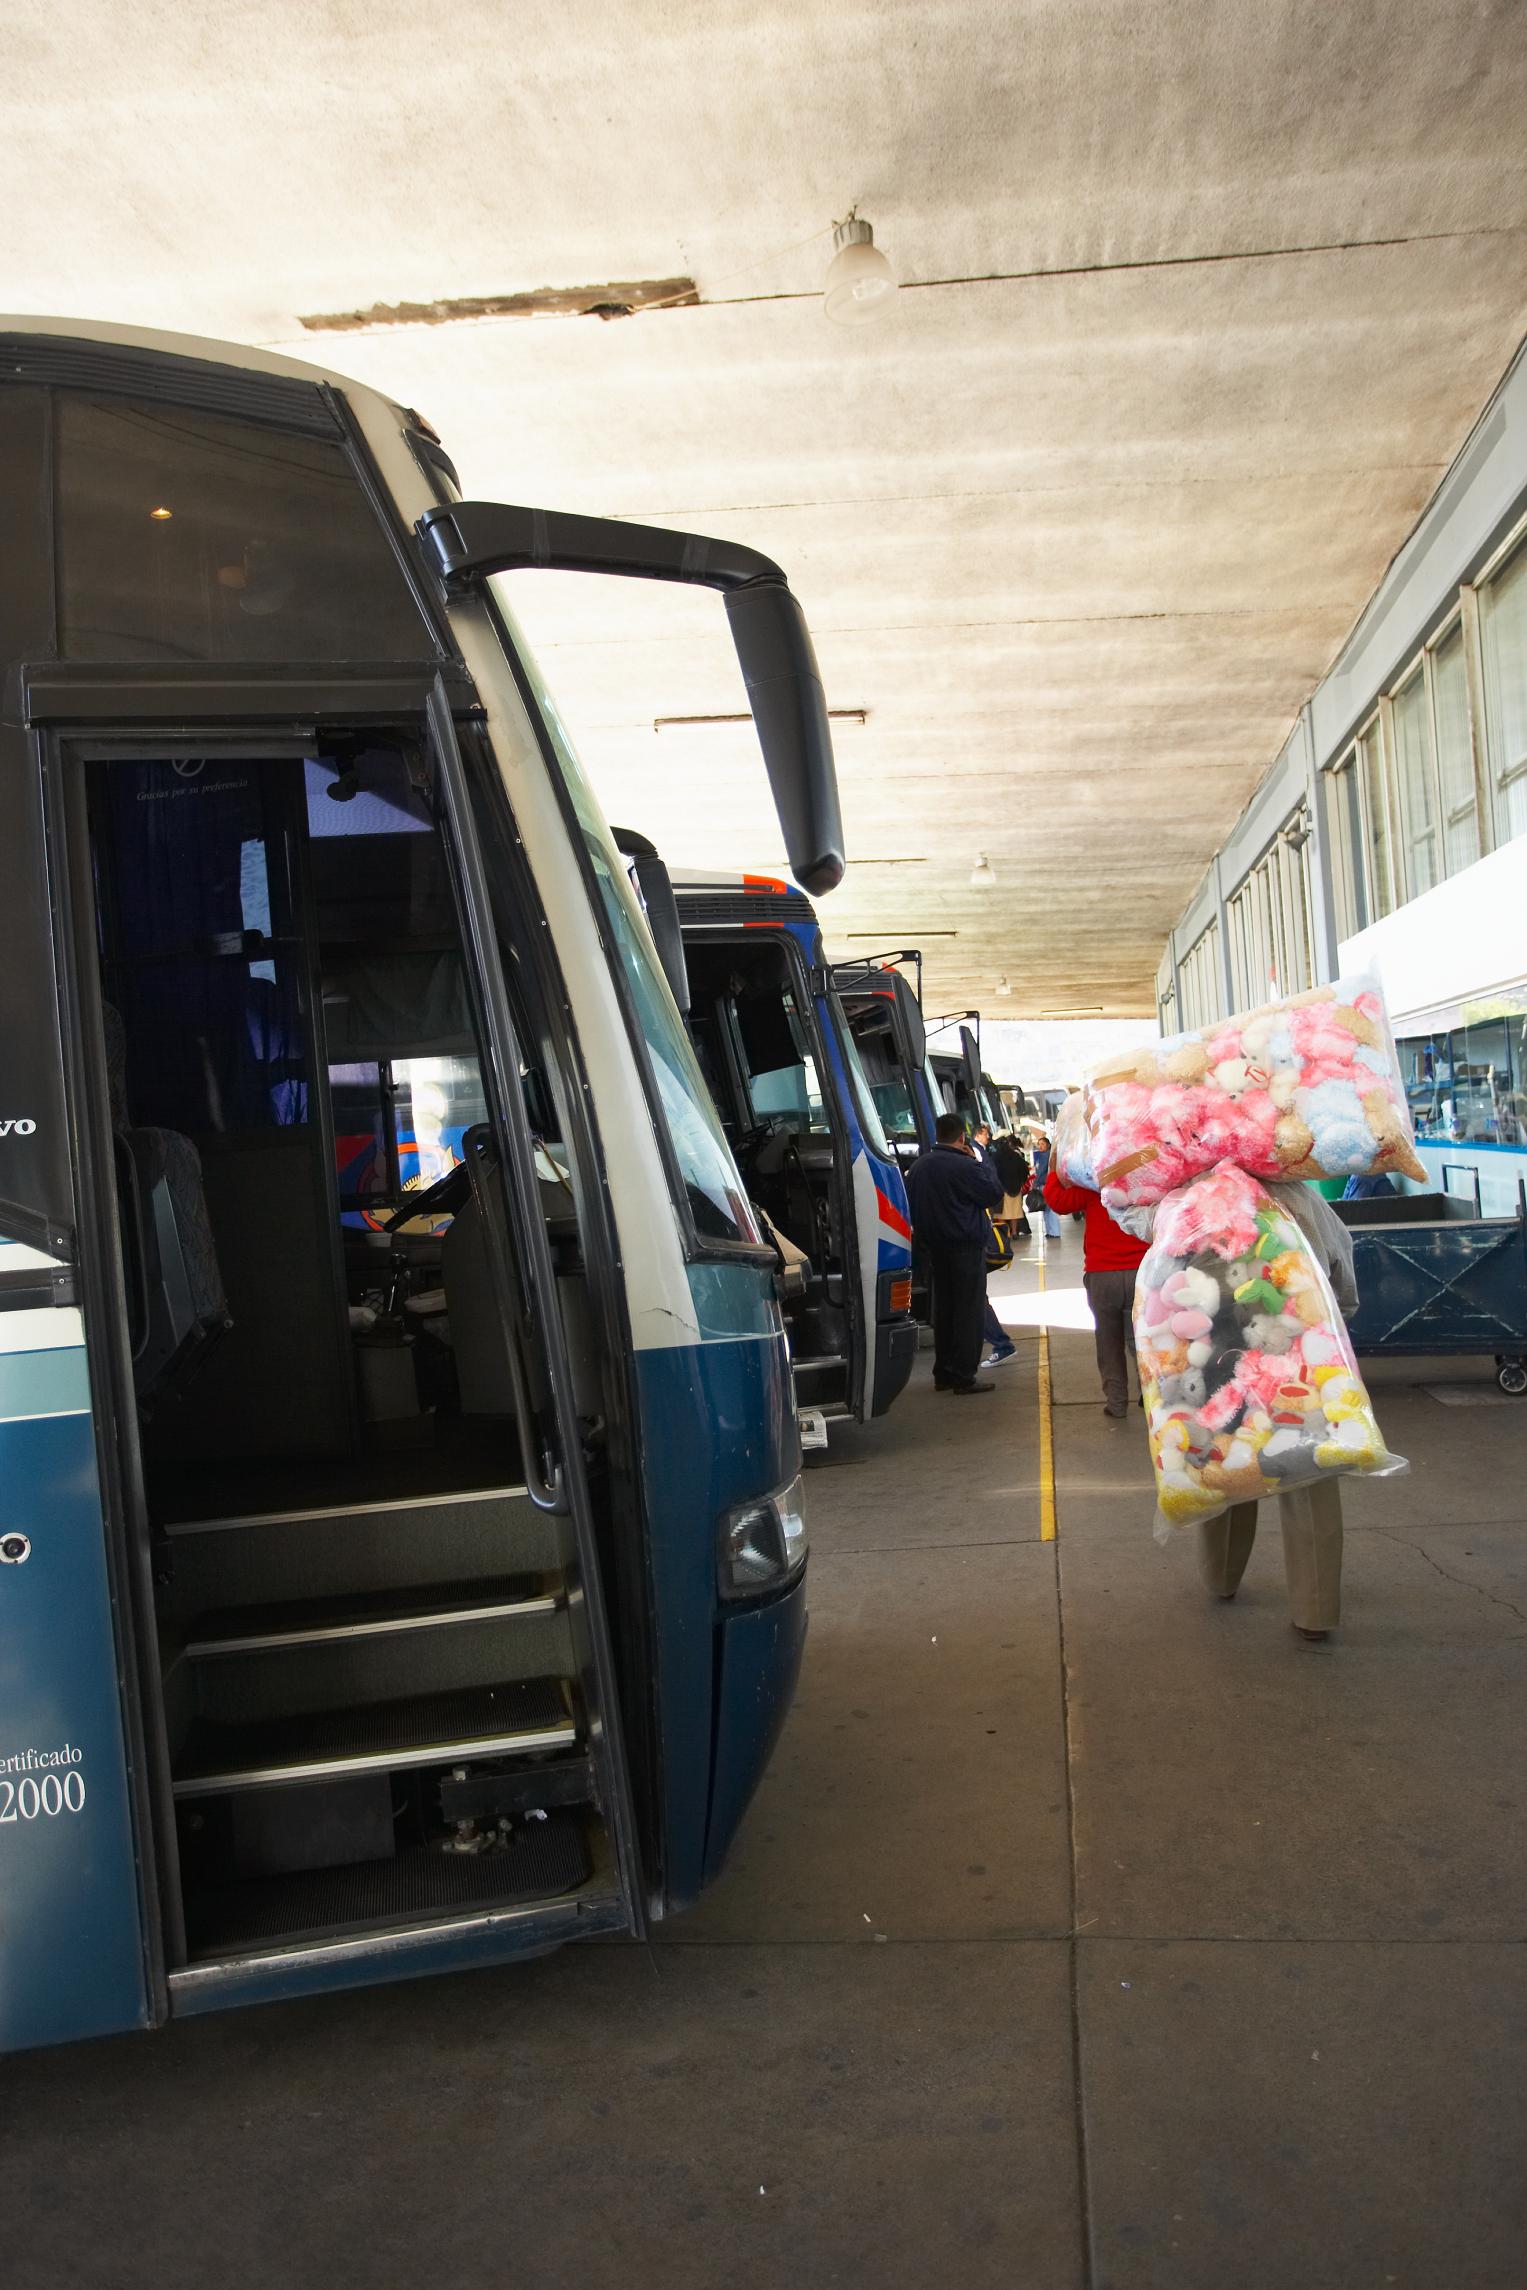 How to Take a Greyhound Bus | USA Today